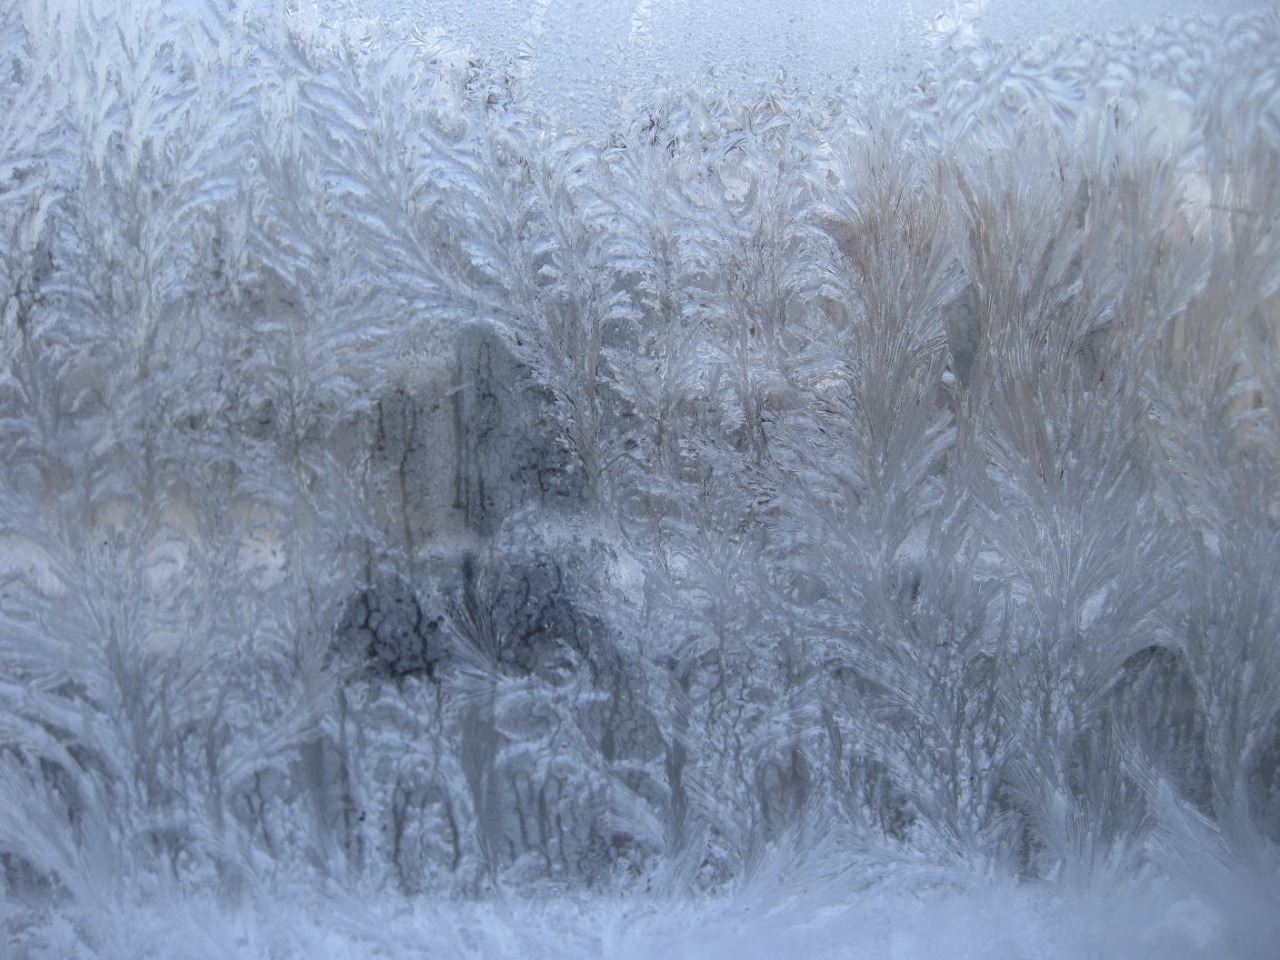 I love winter so much.